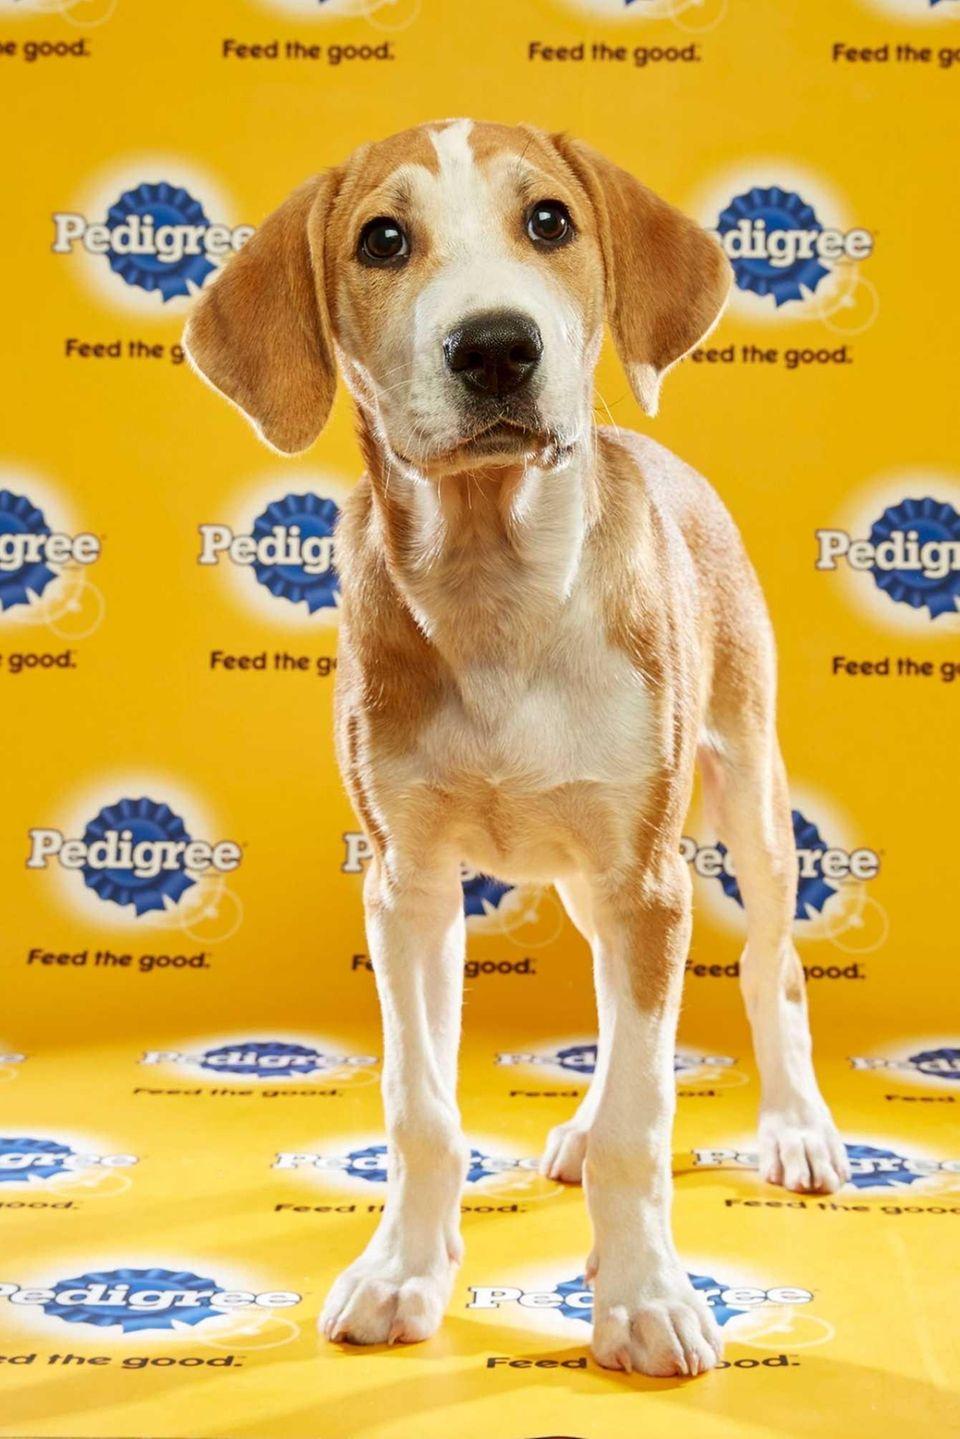 Hank (Team Ruff) is a 12-week-old male yellow